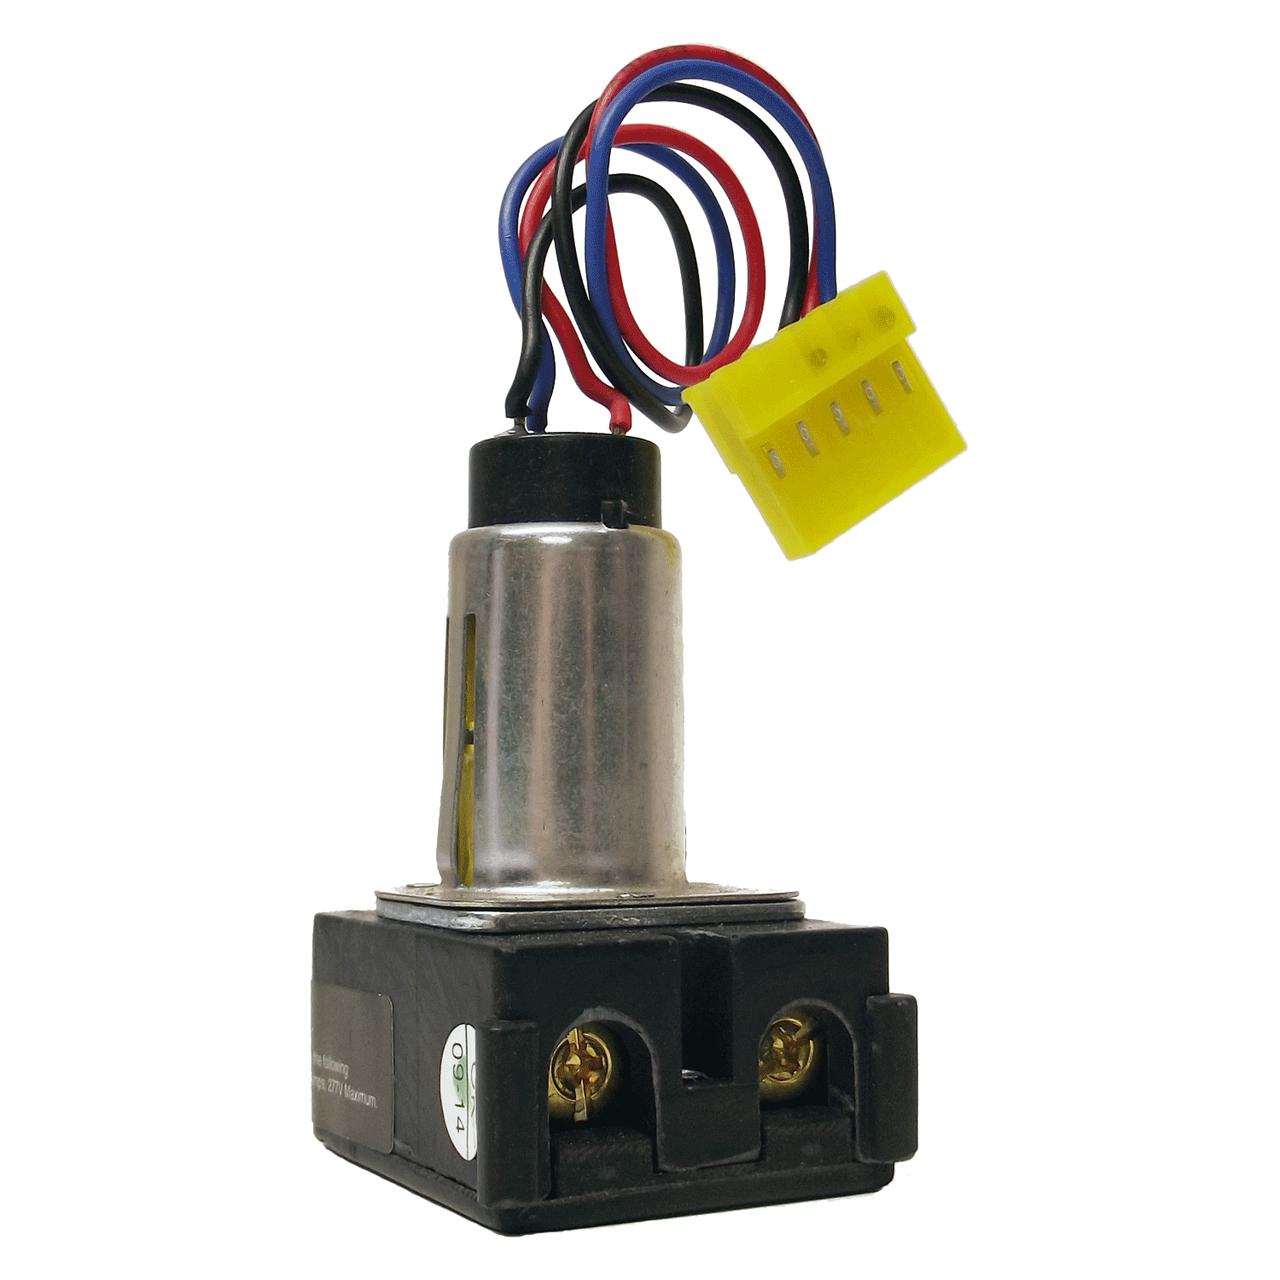 Surprising Lighting Time Rr7 Relay Wiring Diagram Ge Lighting Control Relays Wiring Digital Resources Talizslowmaporg